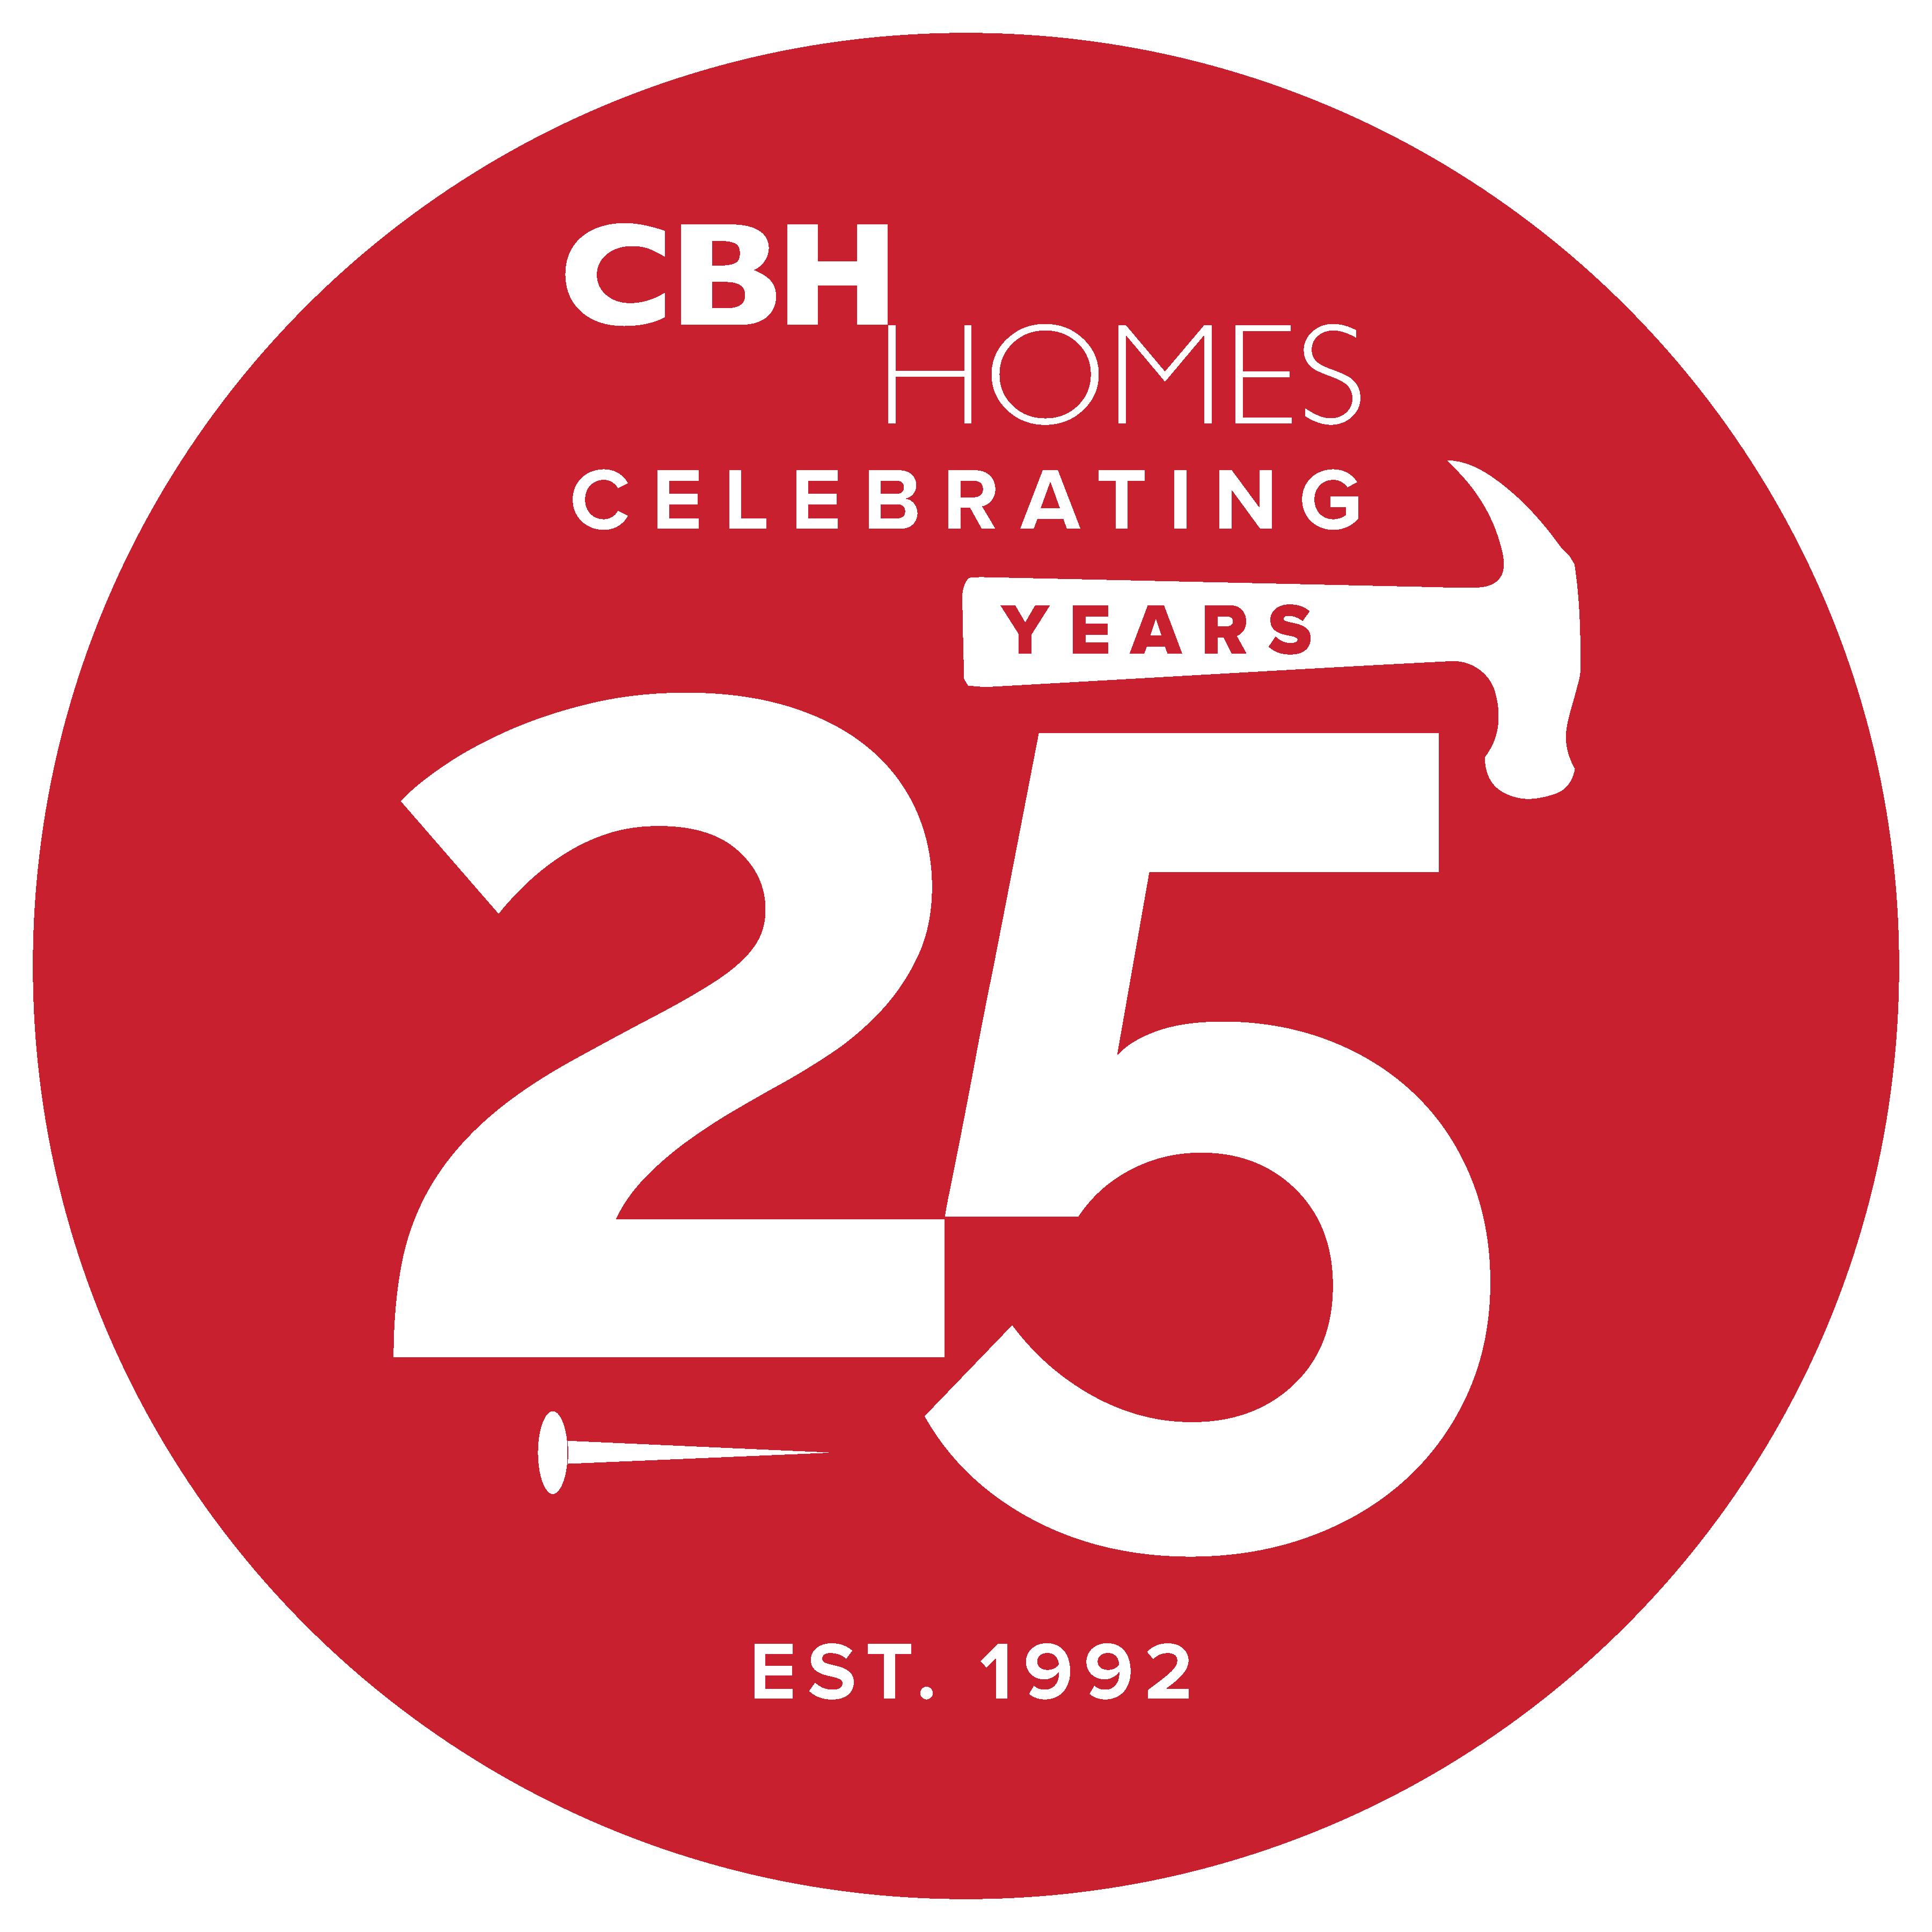 cbh_25yrlogo_4-high-res-red